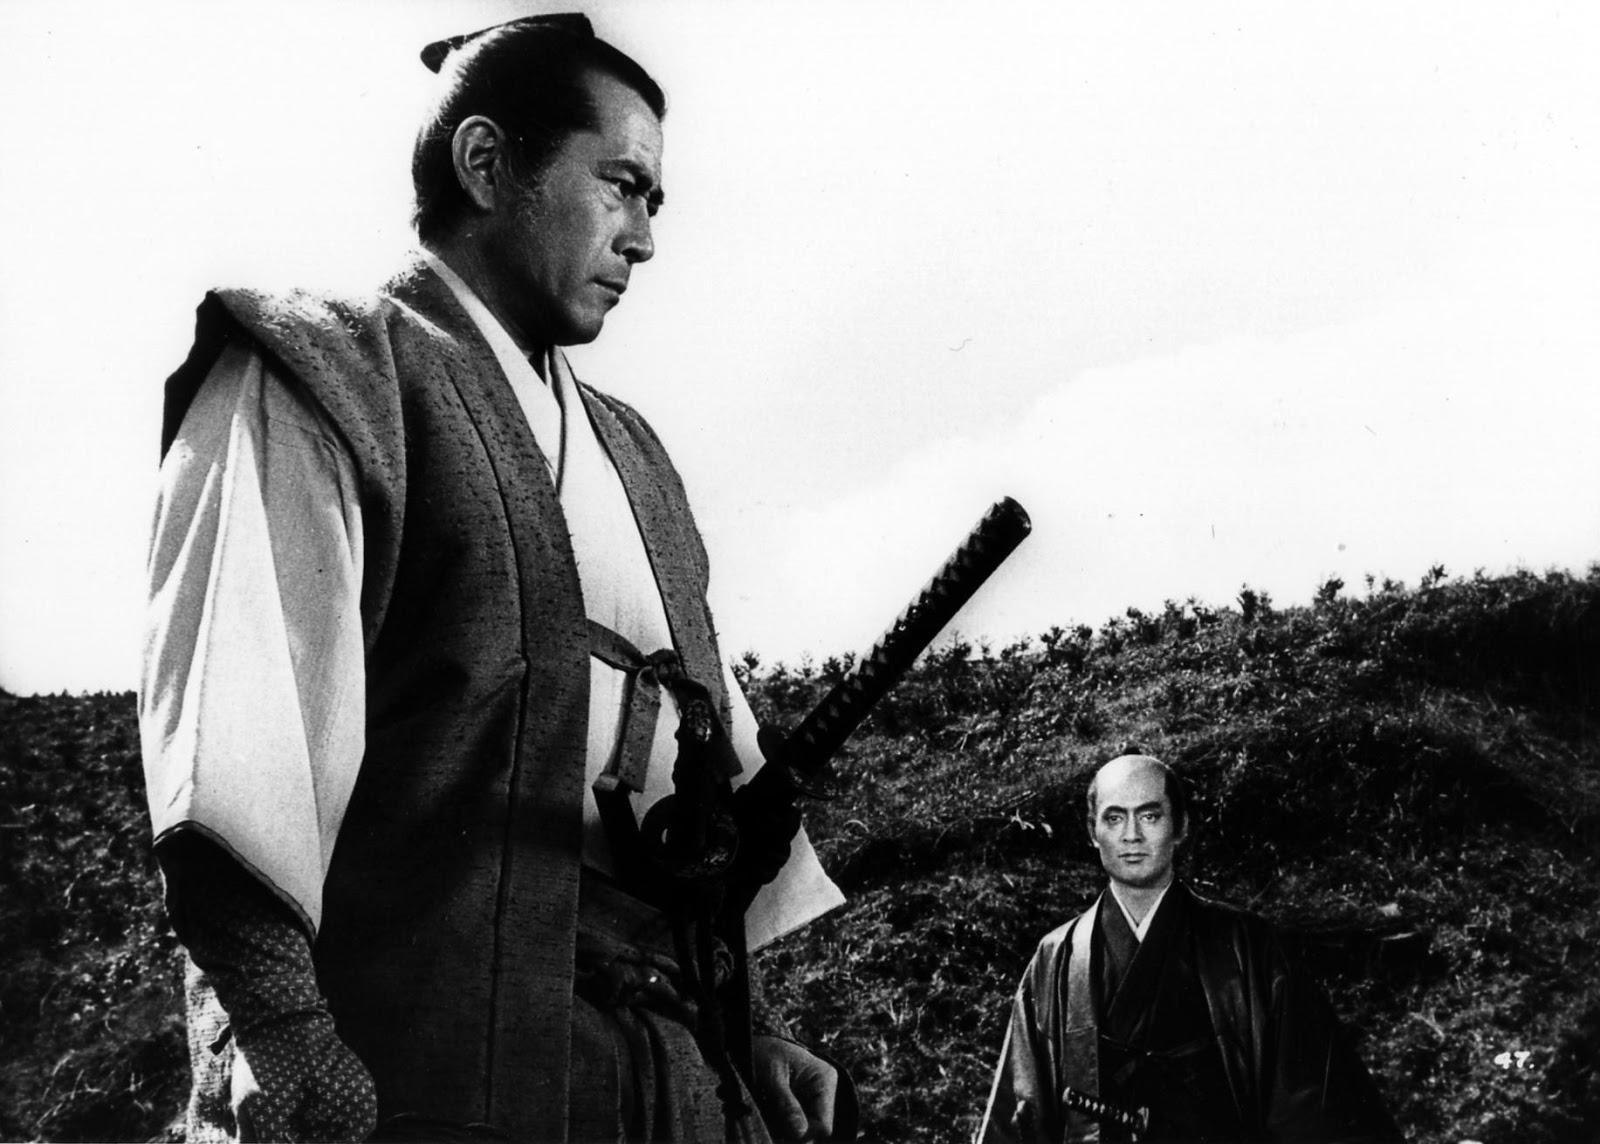 https://www.melbournecinematheque.org/wp-content/uploads/2016/02/samurai-rebellion.jpg